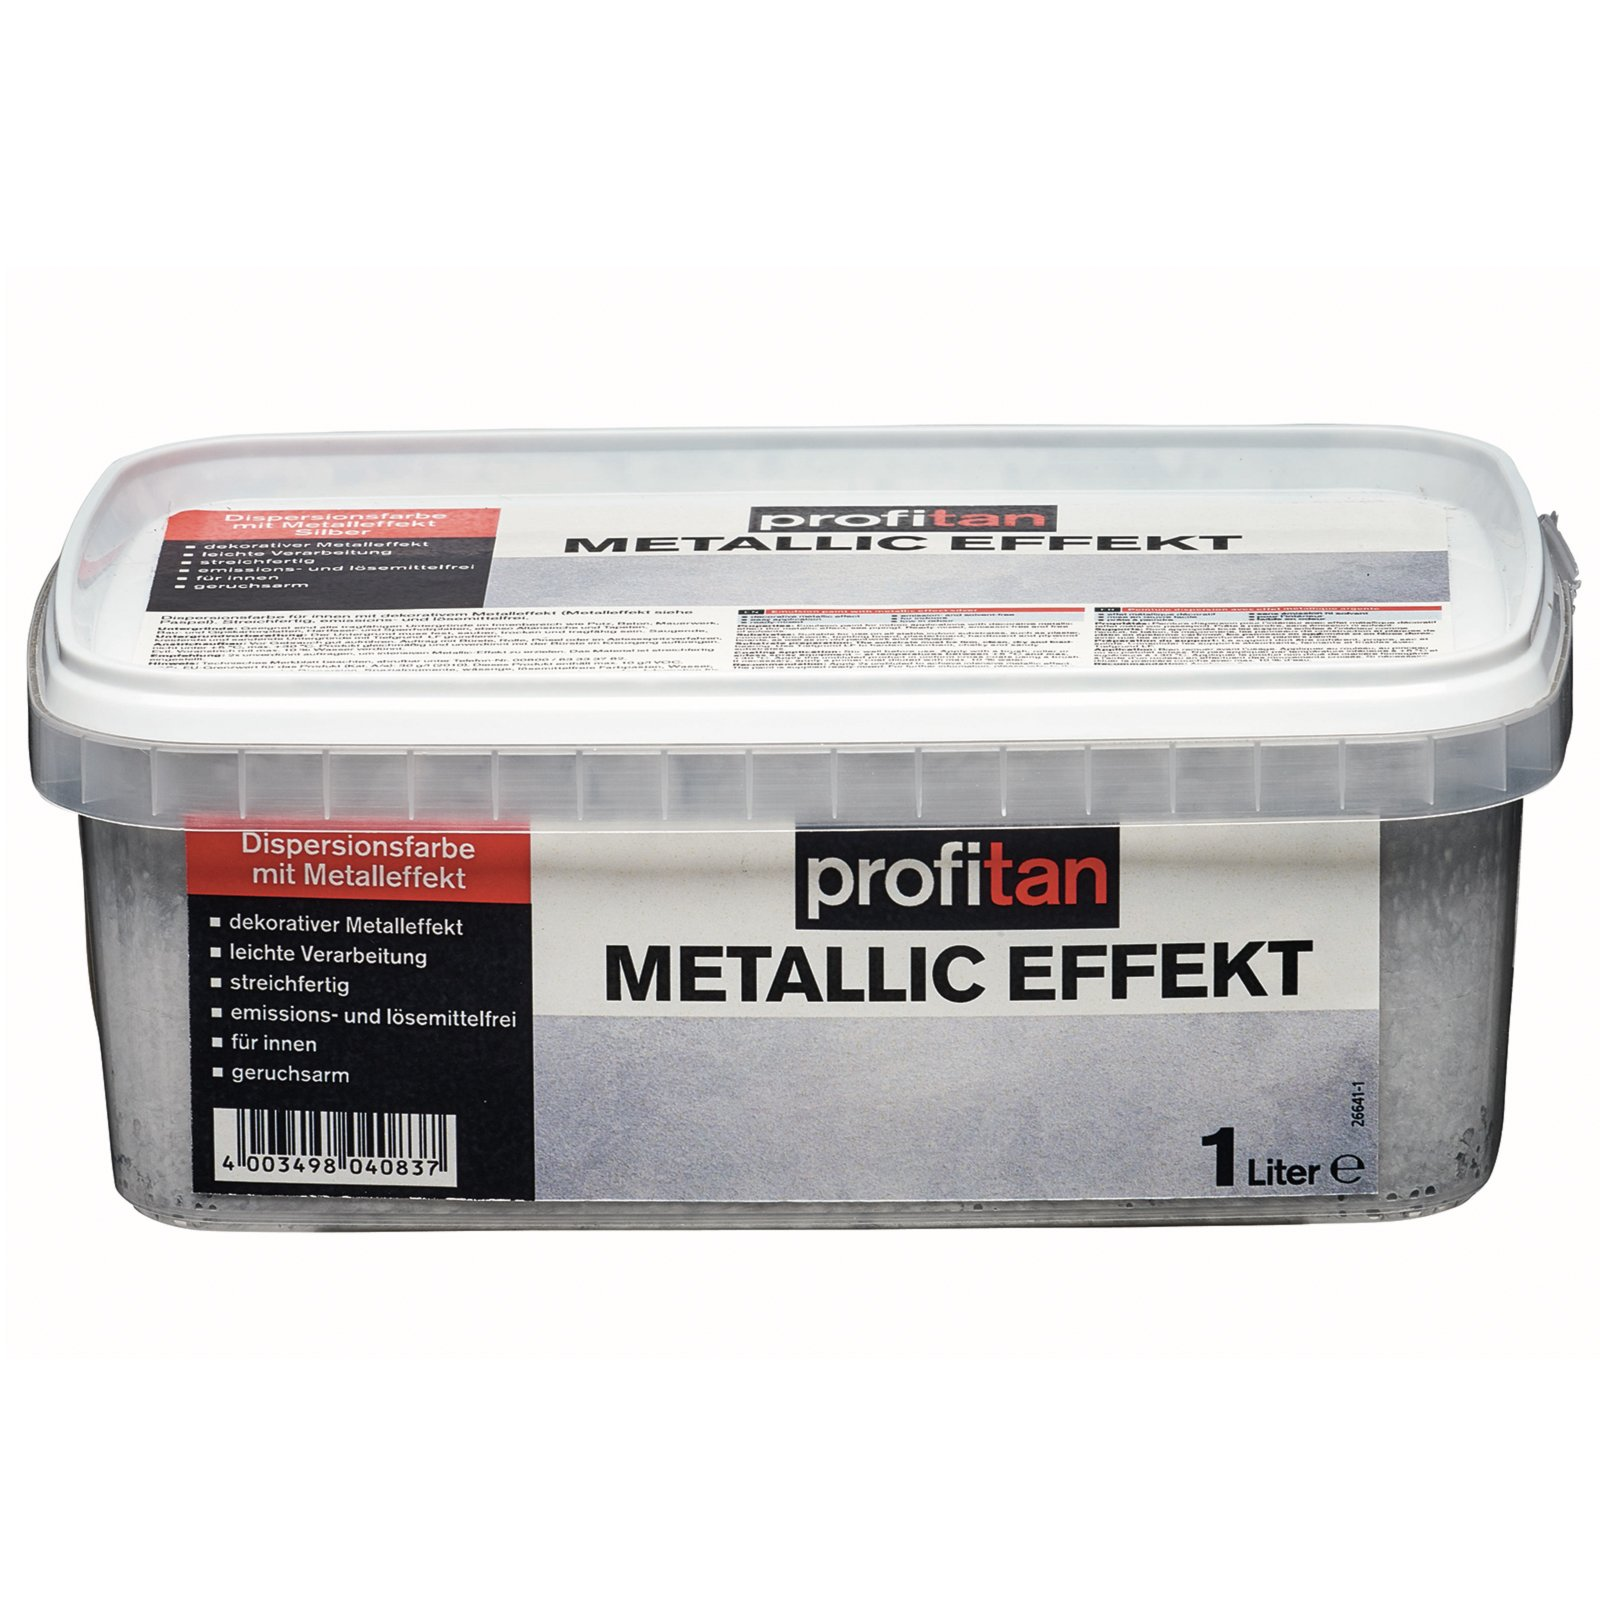 Wandfarbe Mit Effekt: Profitan Metallic Effekt - Silber - 1 Liter